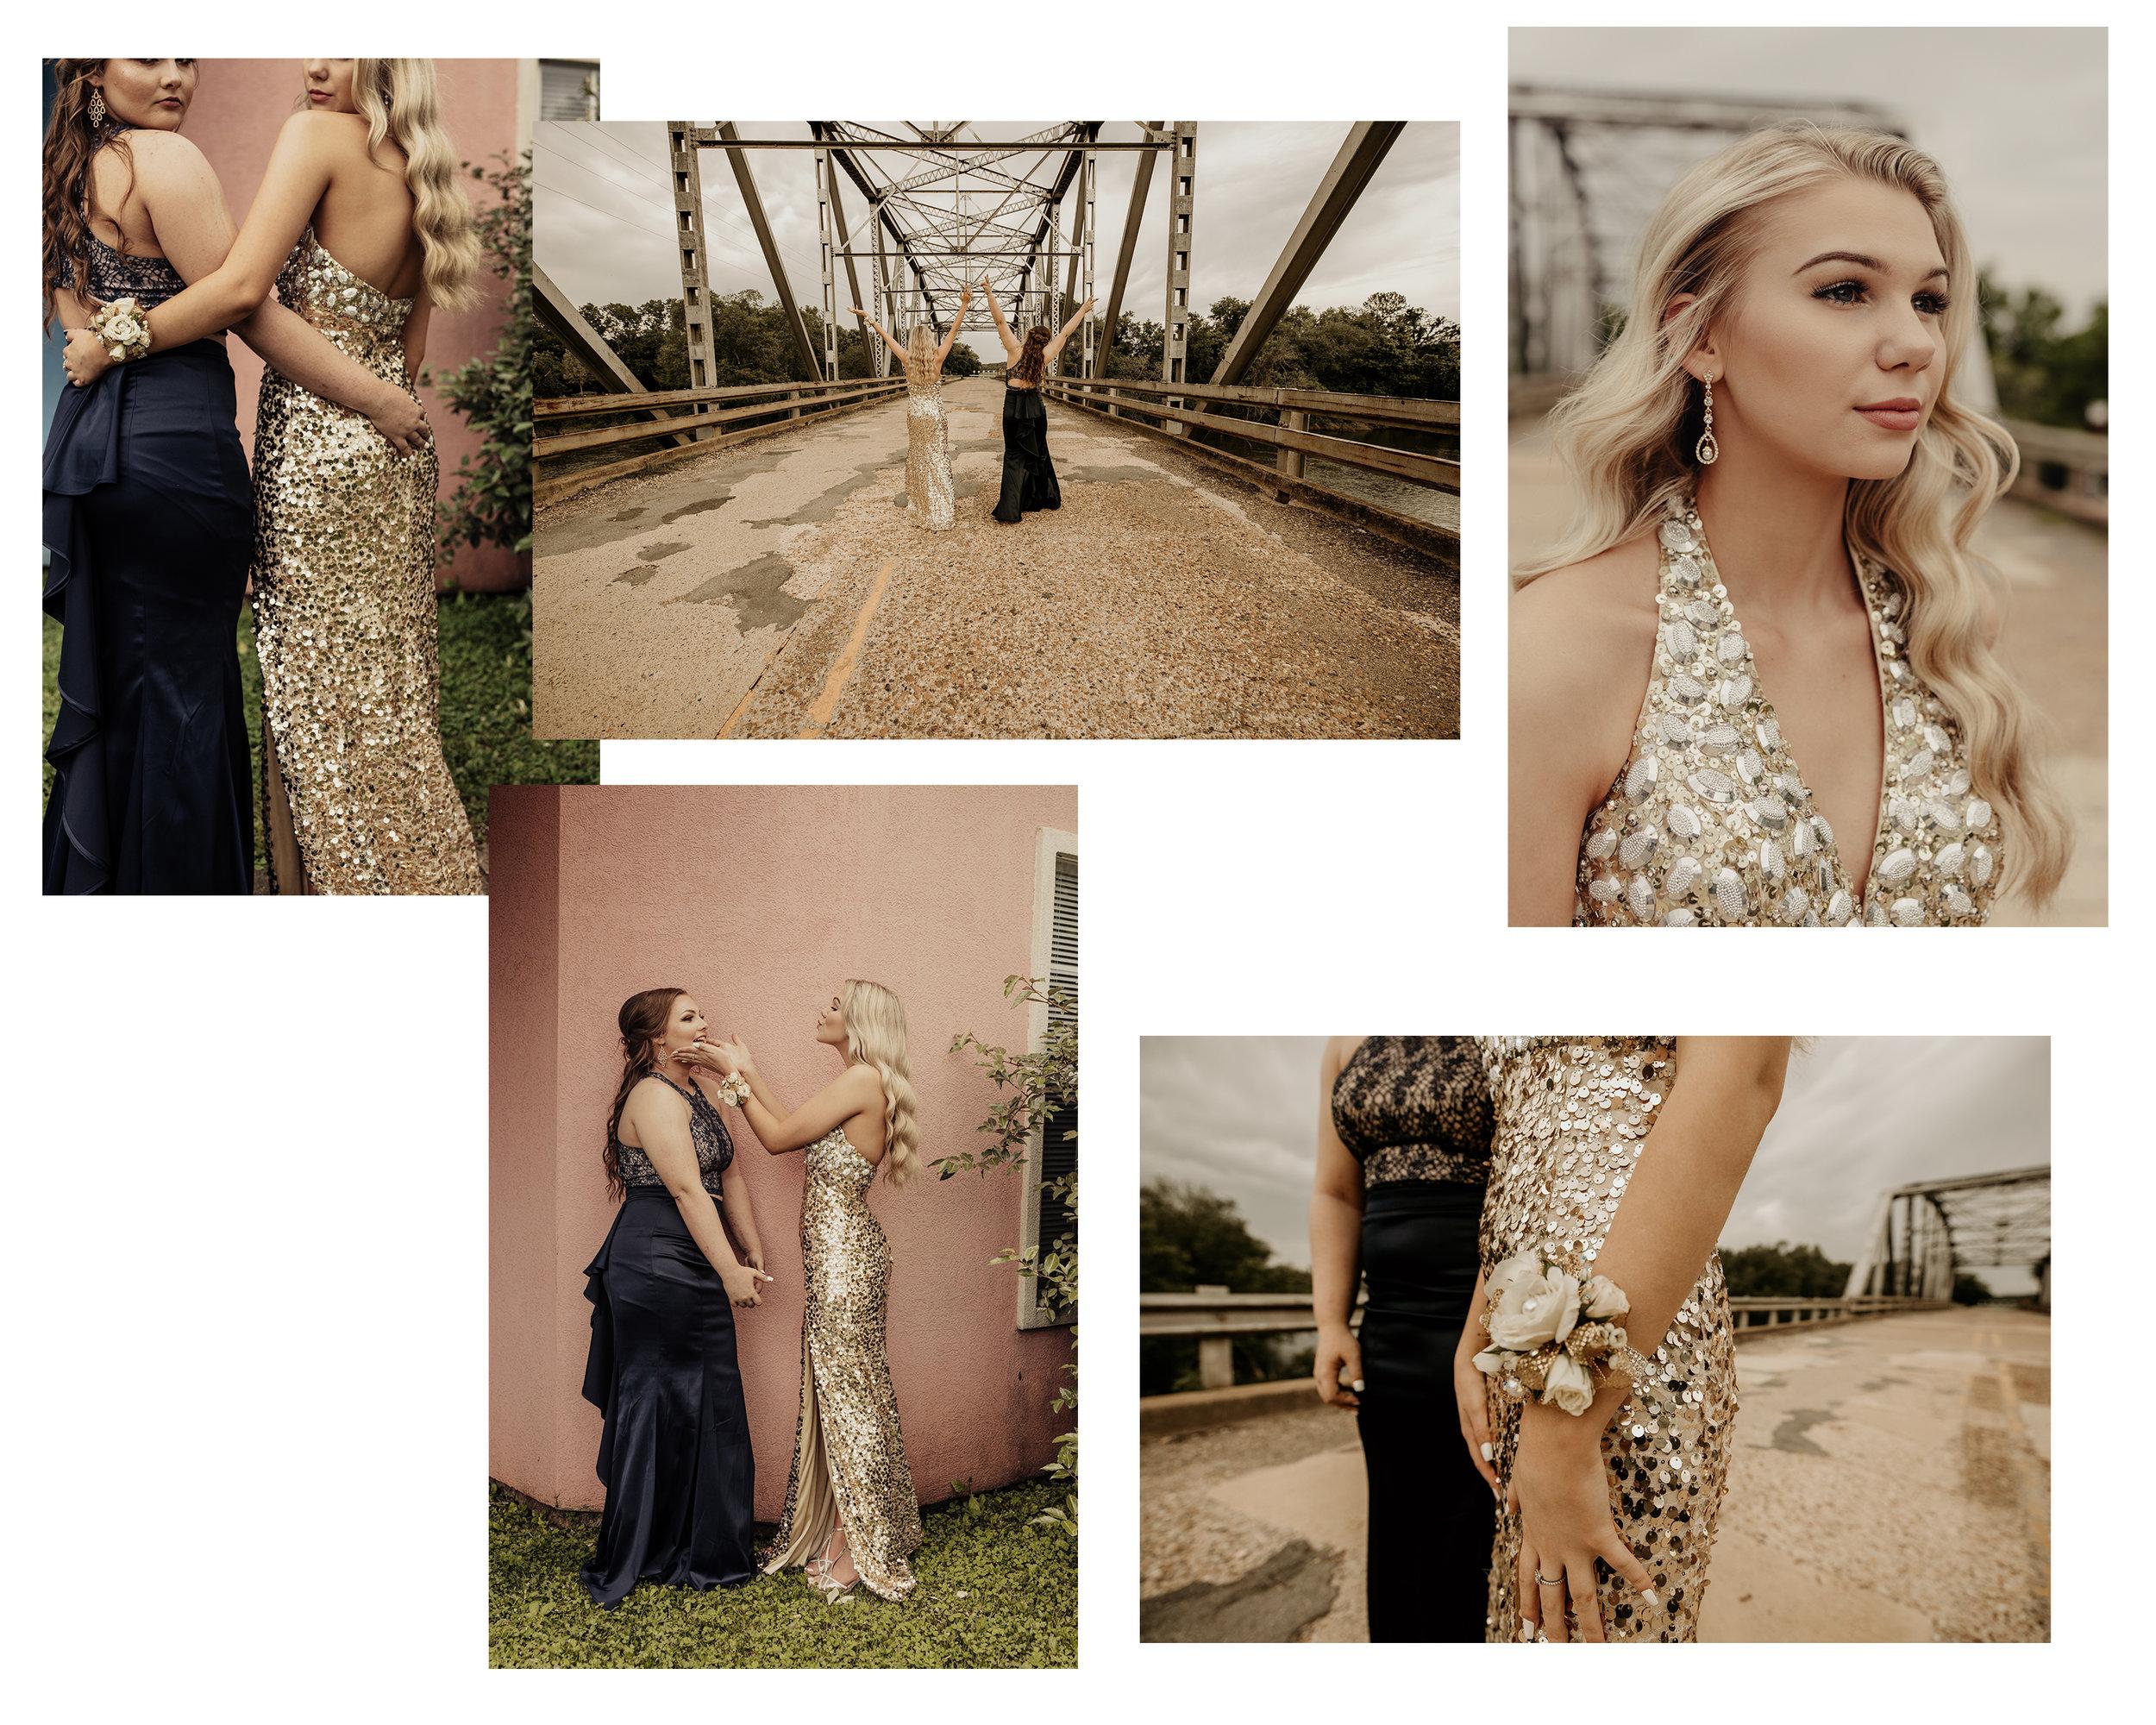 SENIOR-conway-central-arkansas-bridal-photographer-little-rock-photography-outdoor-wedding-boho-fashion-engagement-elopement-bouquet-bride-soiree-magazine-photoshoot-arkansasbride-pinnacle-mountain-car-vintage